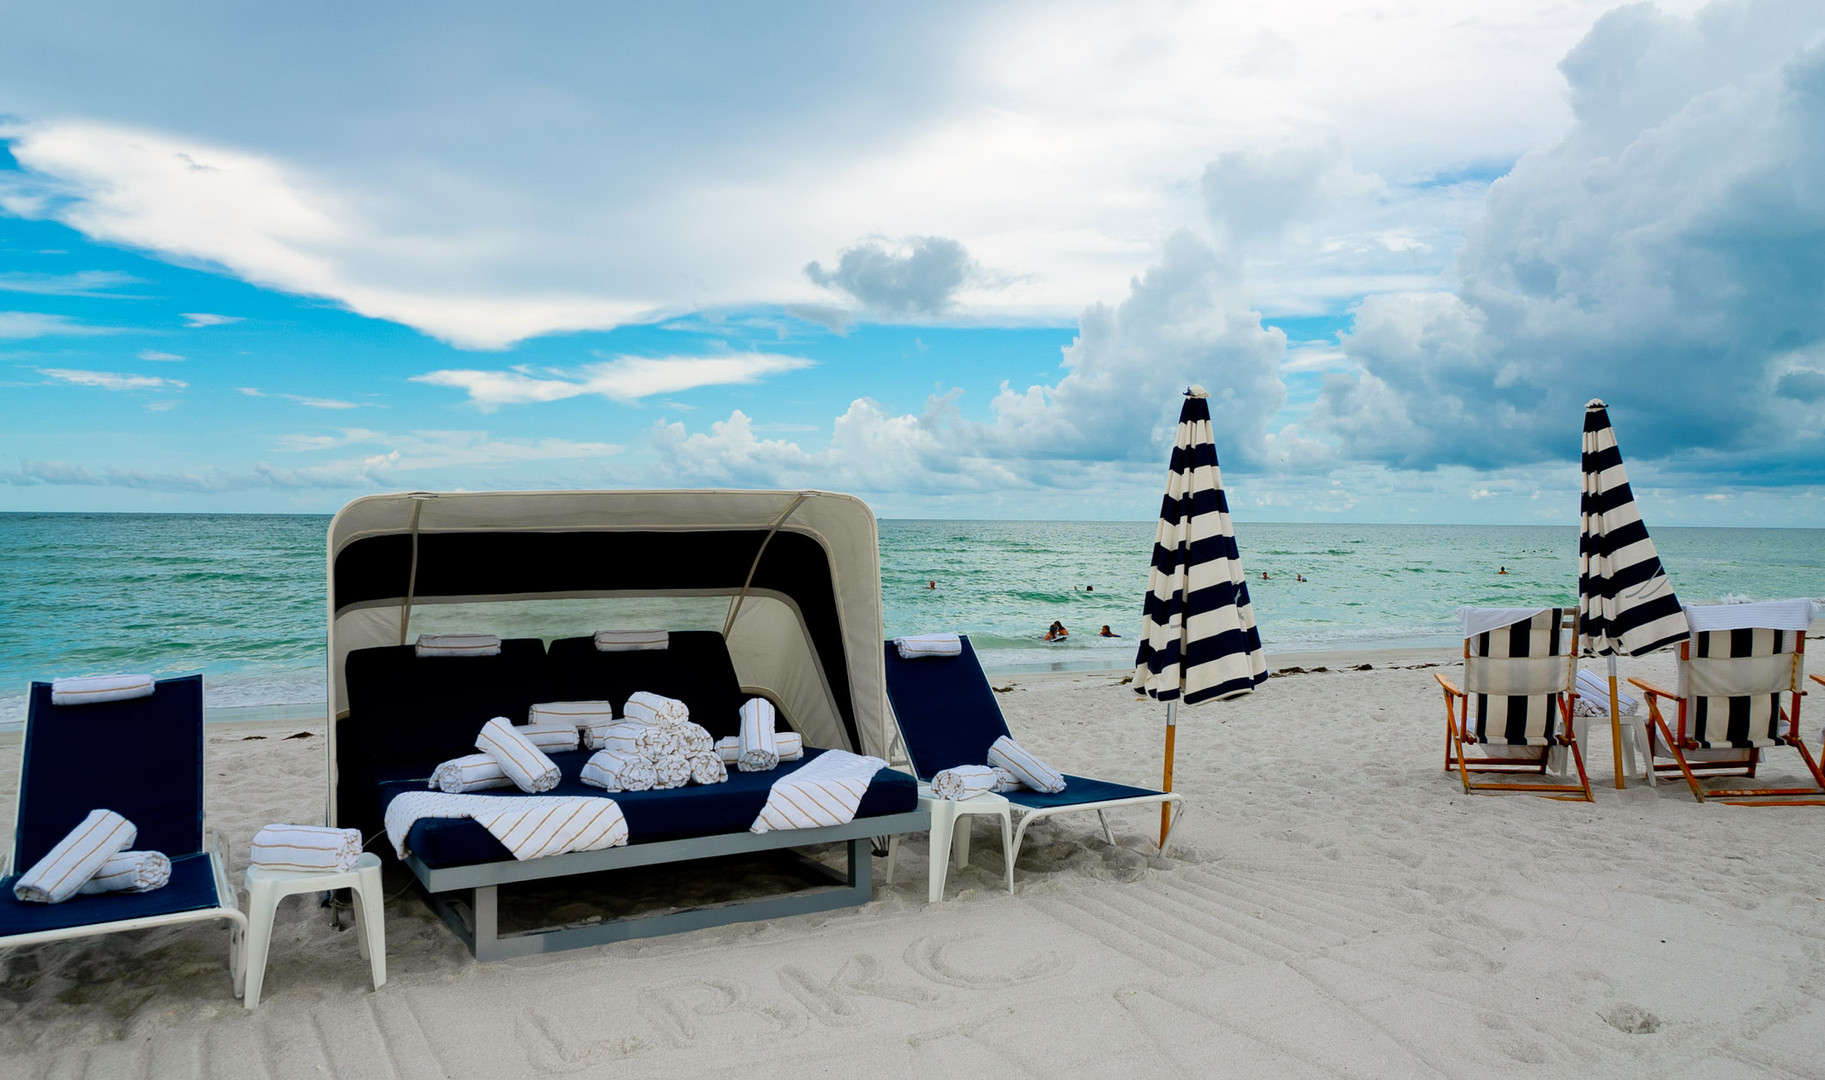 Beach naps!